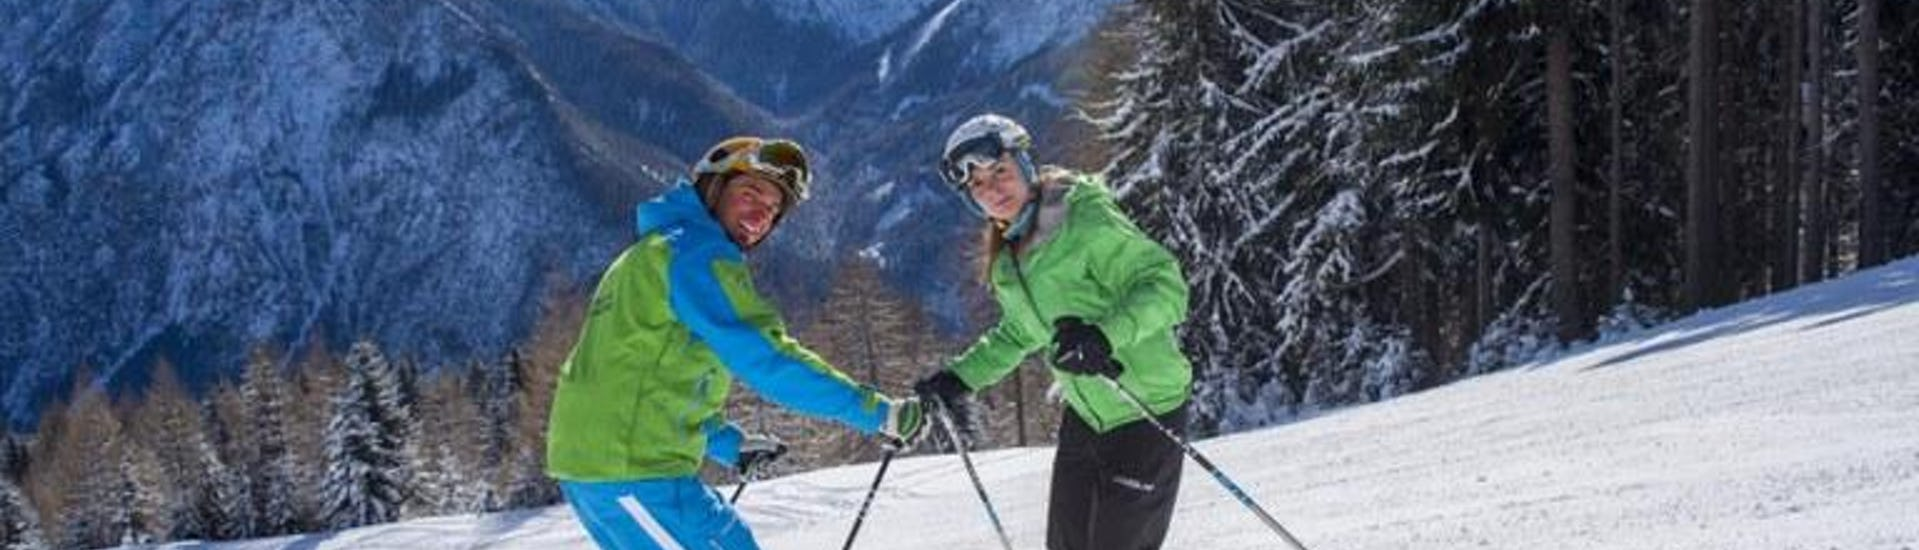 Ski technique training on the slope